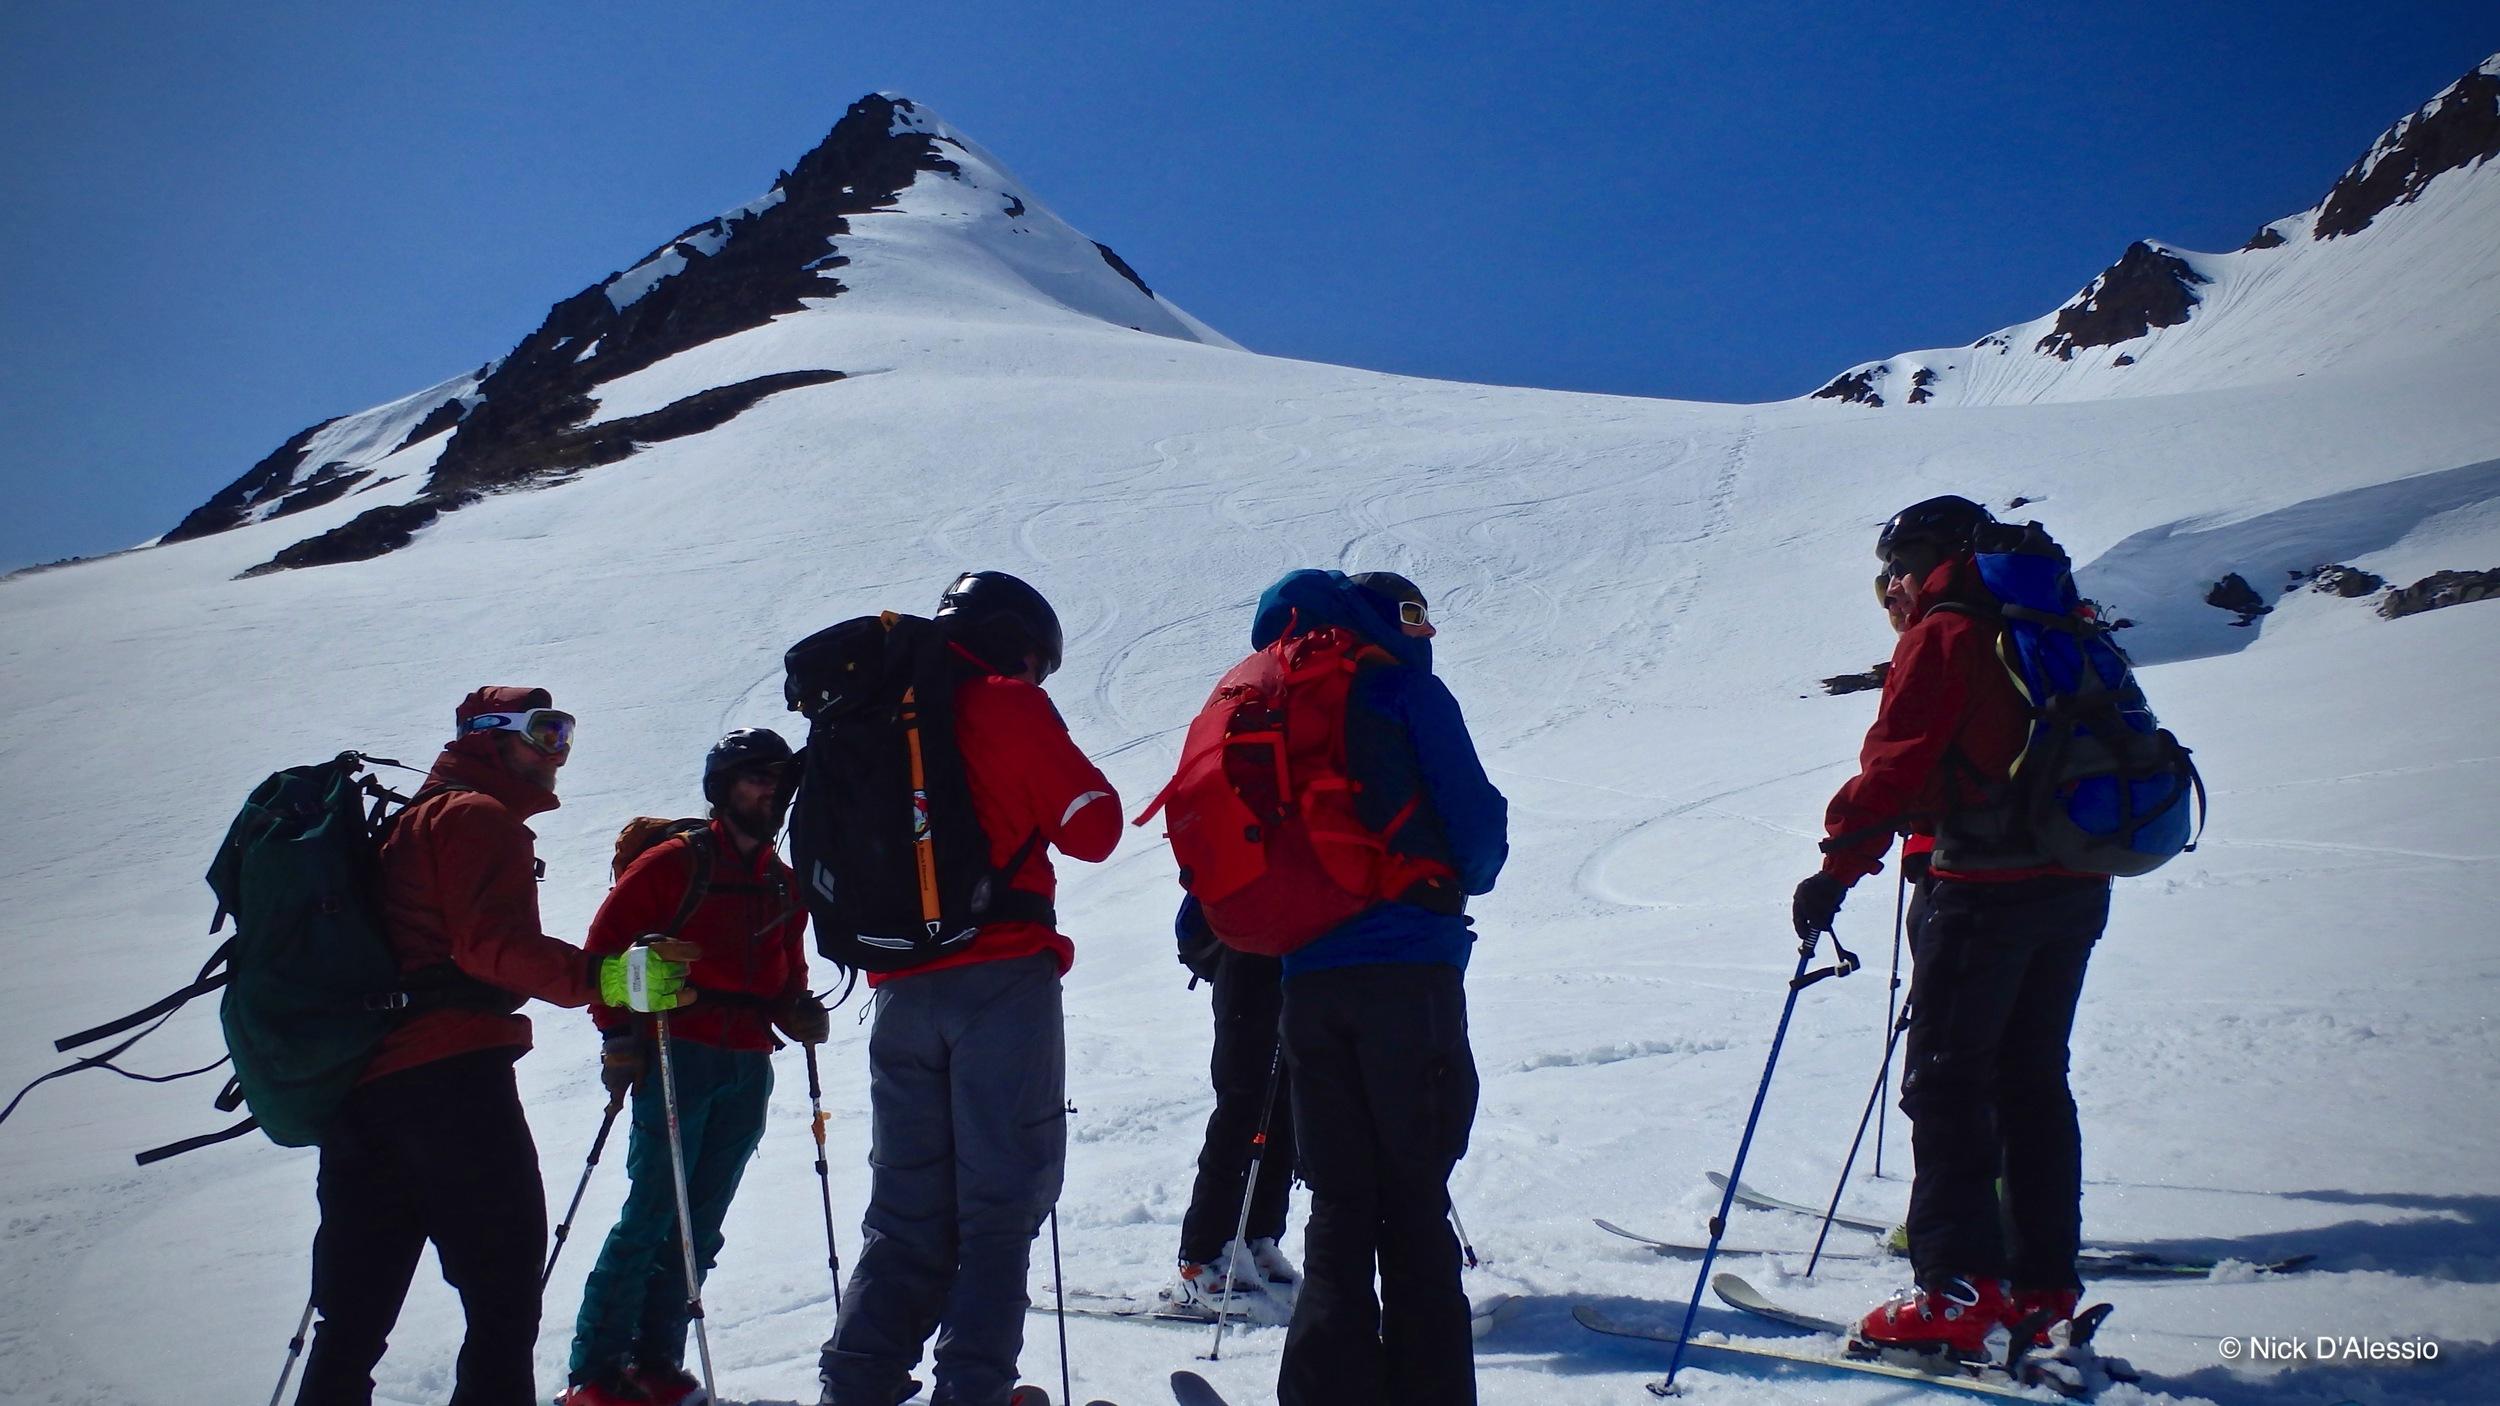 Kodiak Alaska, backcountry skiing